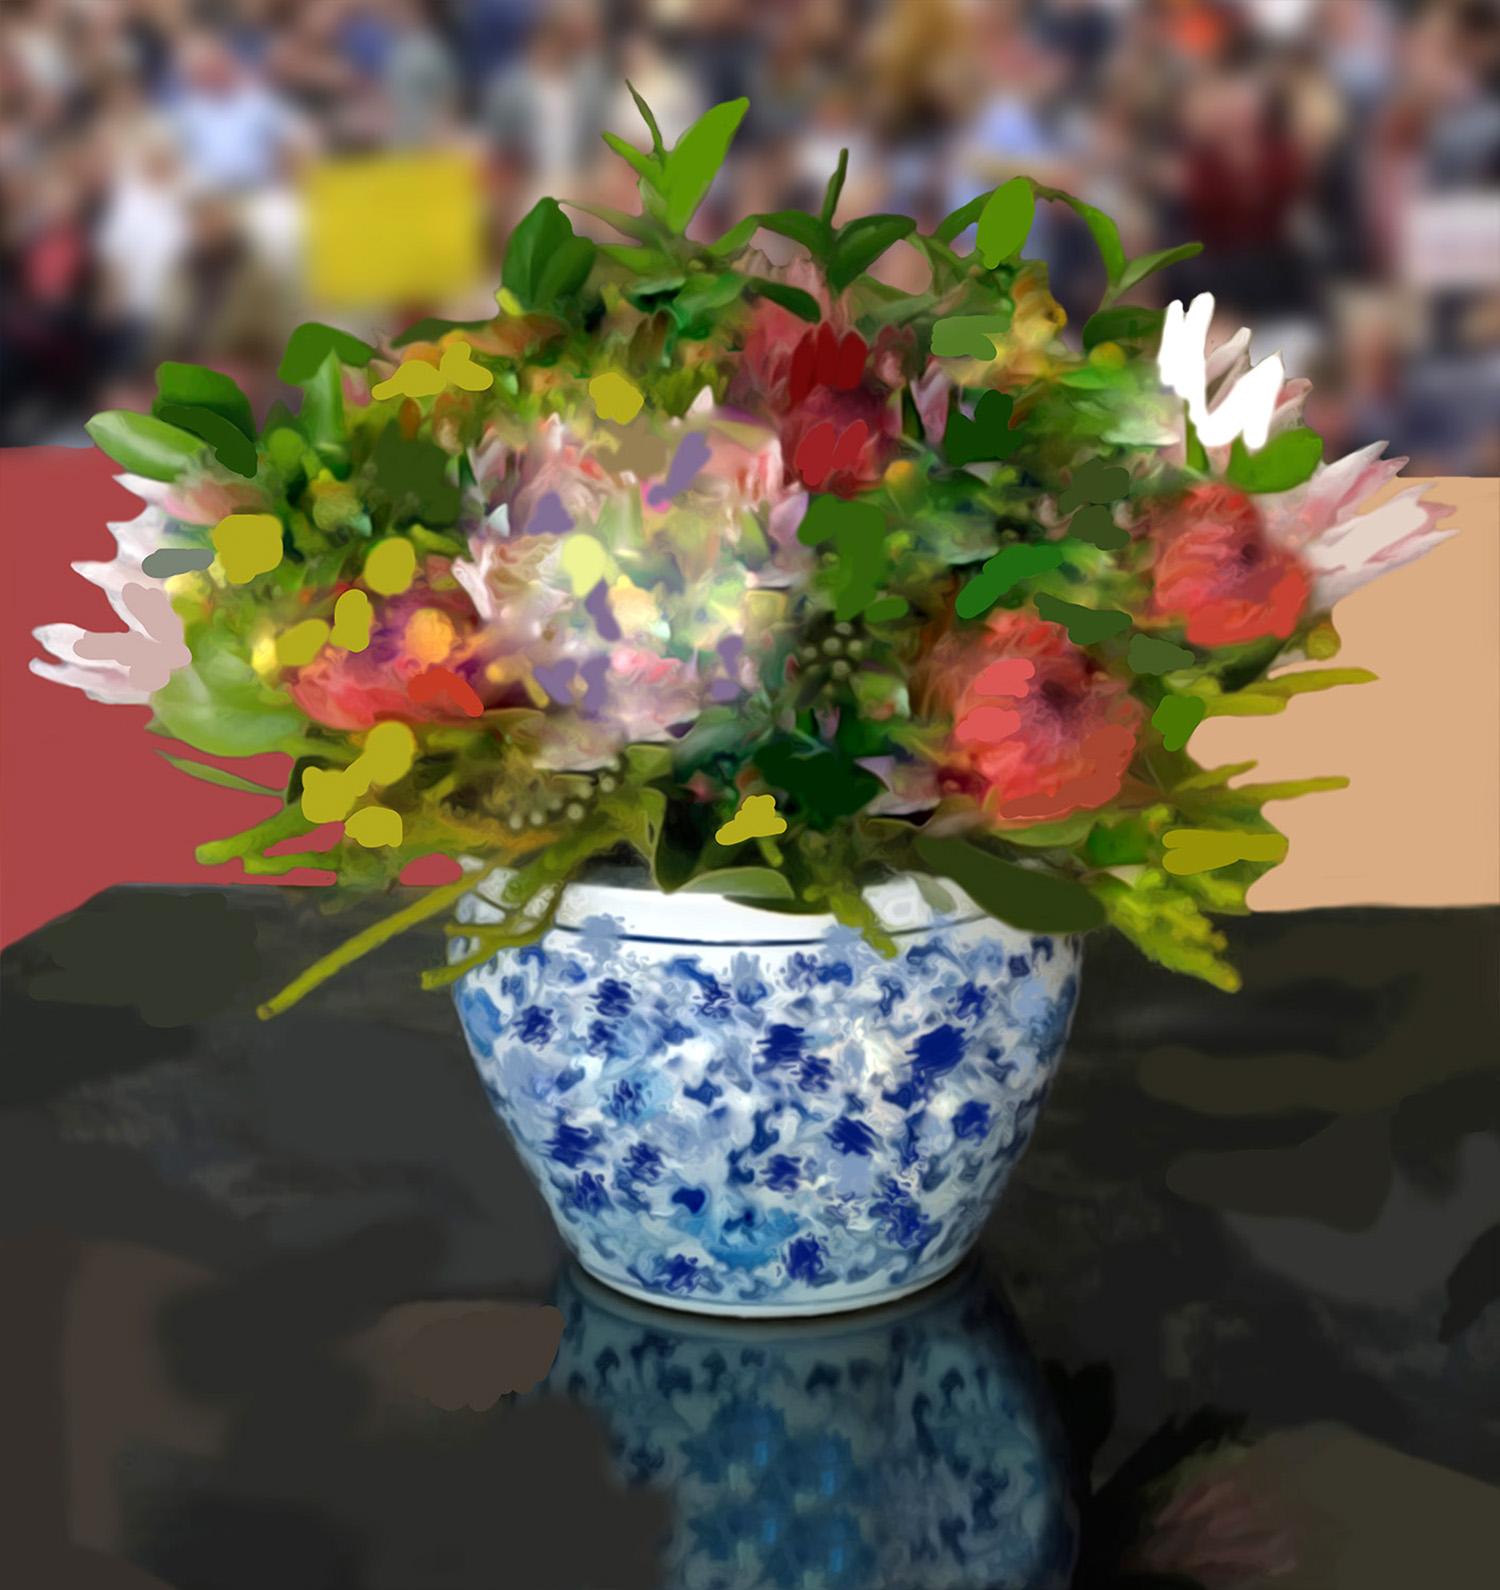 Study After Flowers for Algernon II  © Gregory Eddi Jones